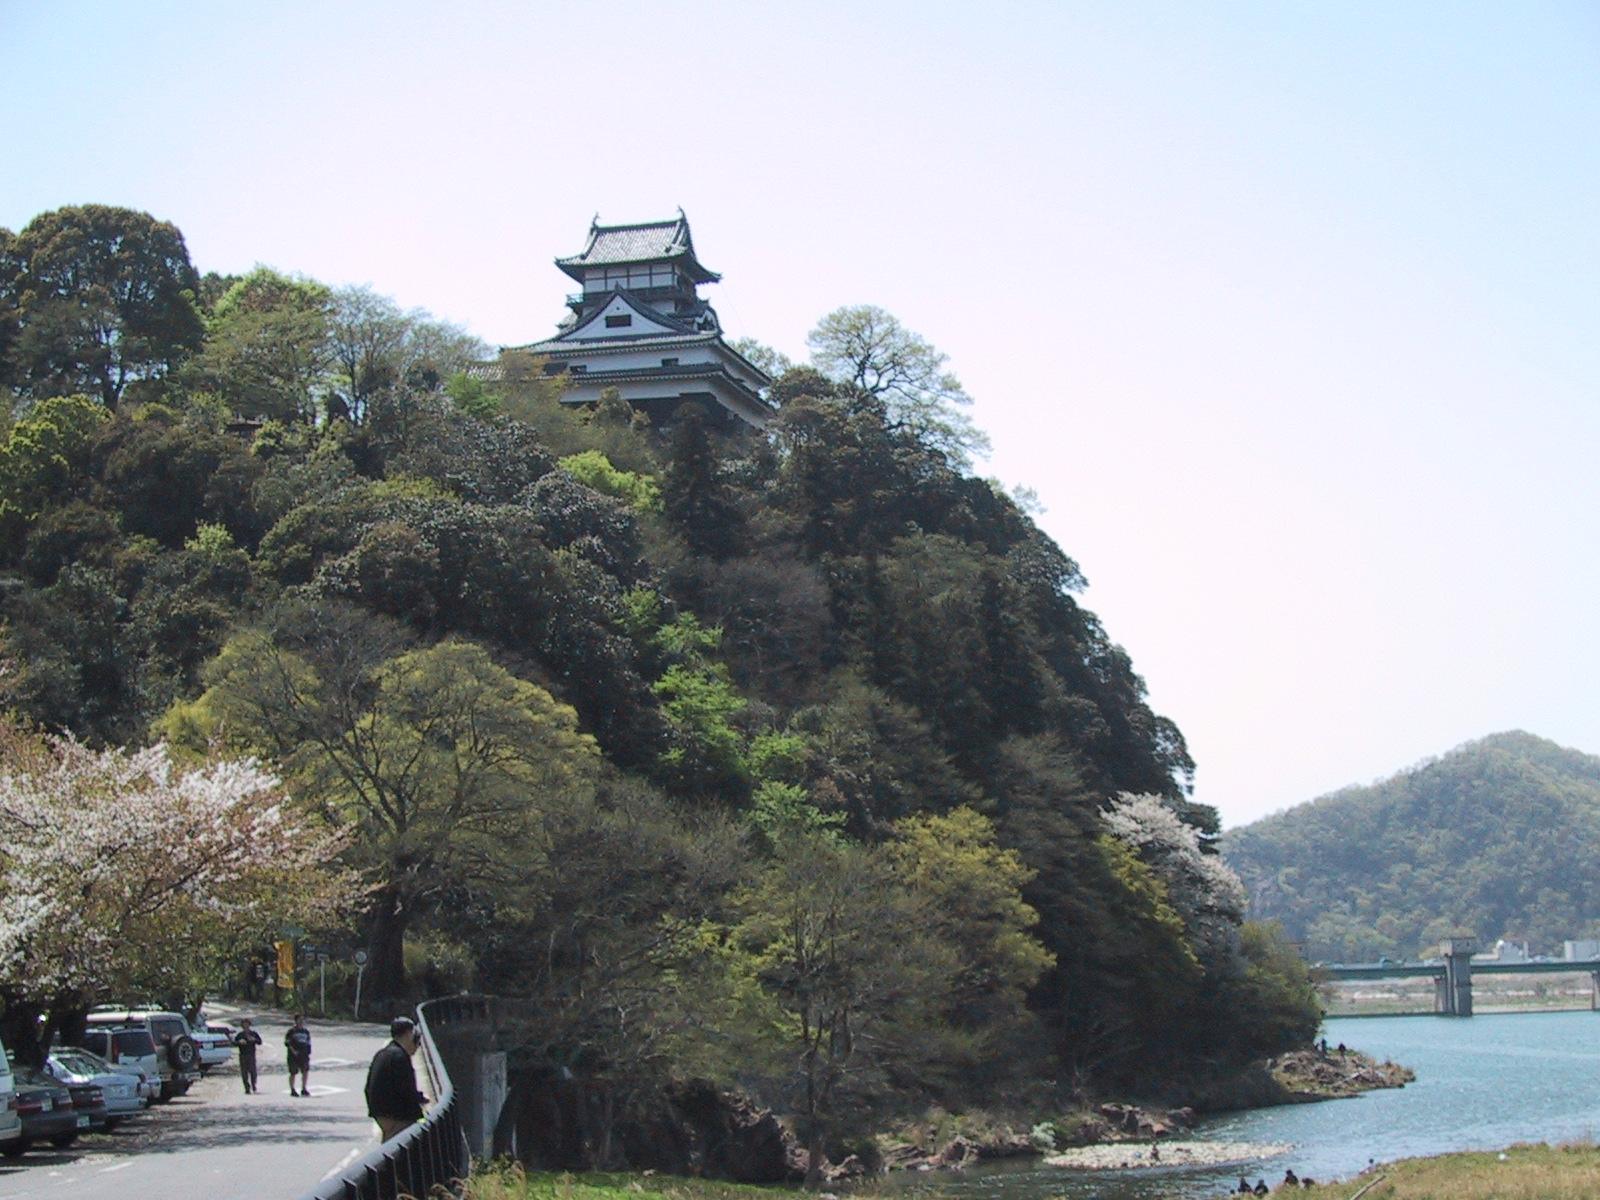 Inuyama Japan  City pictures : Original file  1,600 × 1,200 pixels, file size: 554 KB, MIME type ...